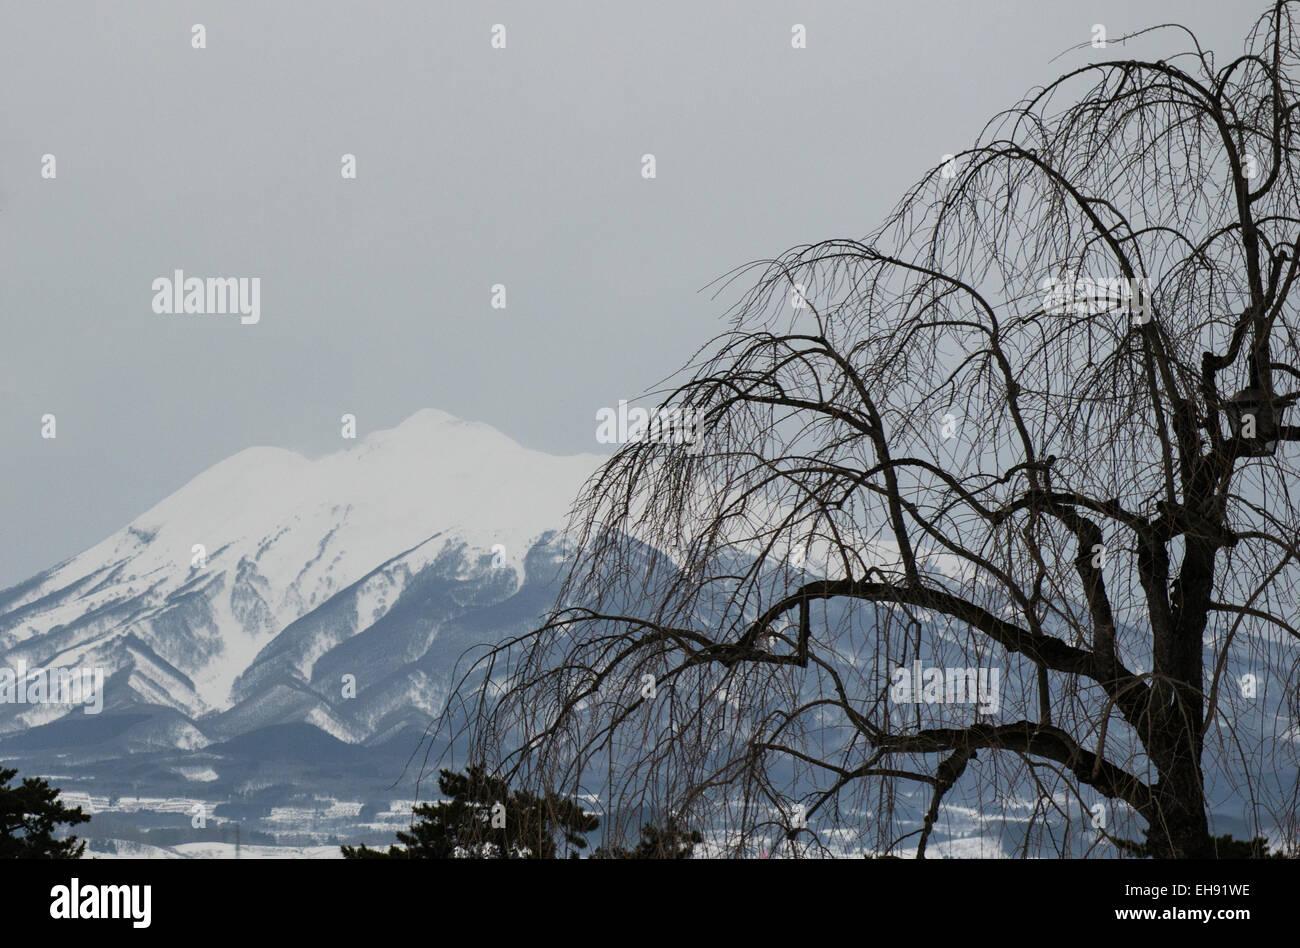 Le mont Iwaki Iwaki (SAN) de la préfecture d'Aomori, Tohoku, Japon. Photo Stock